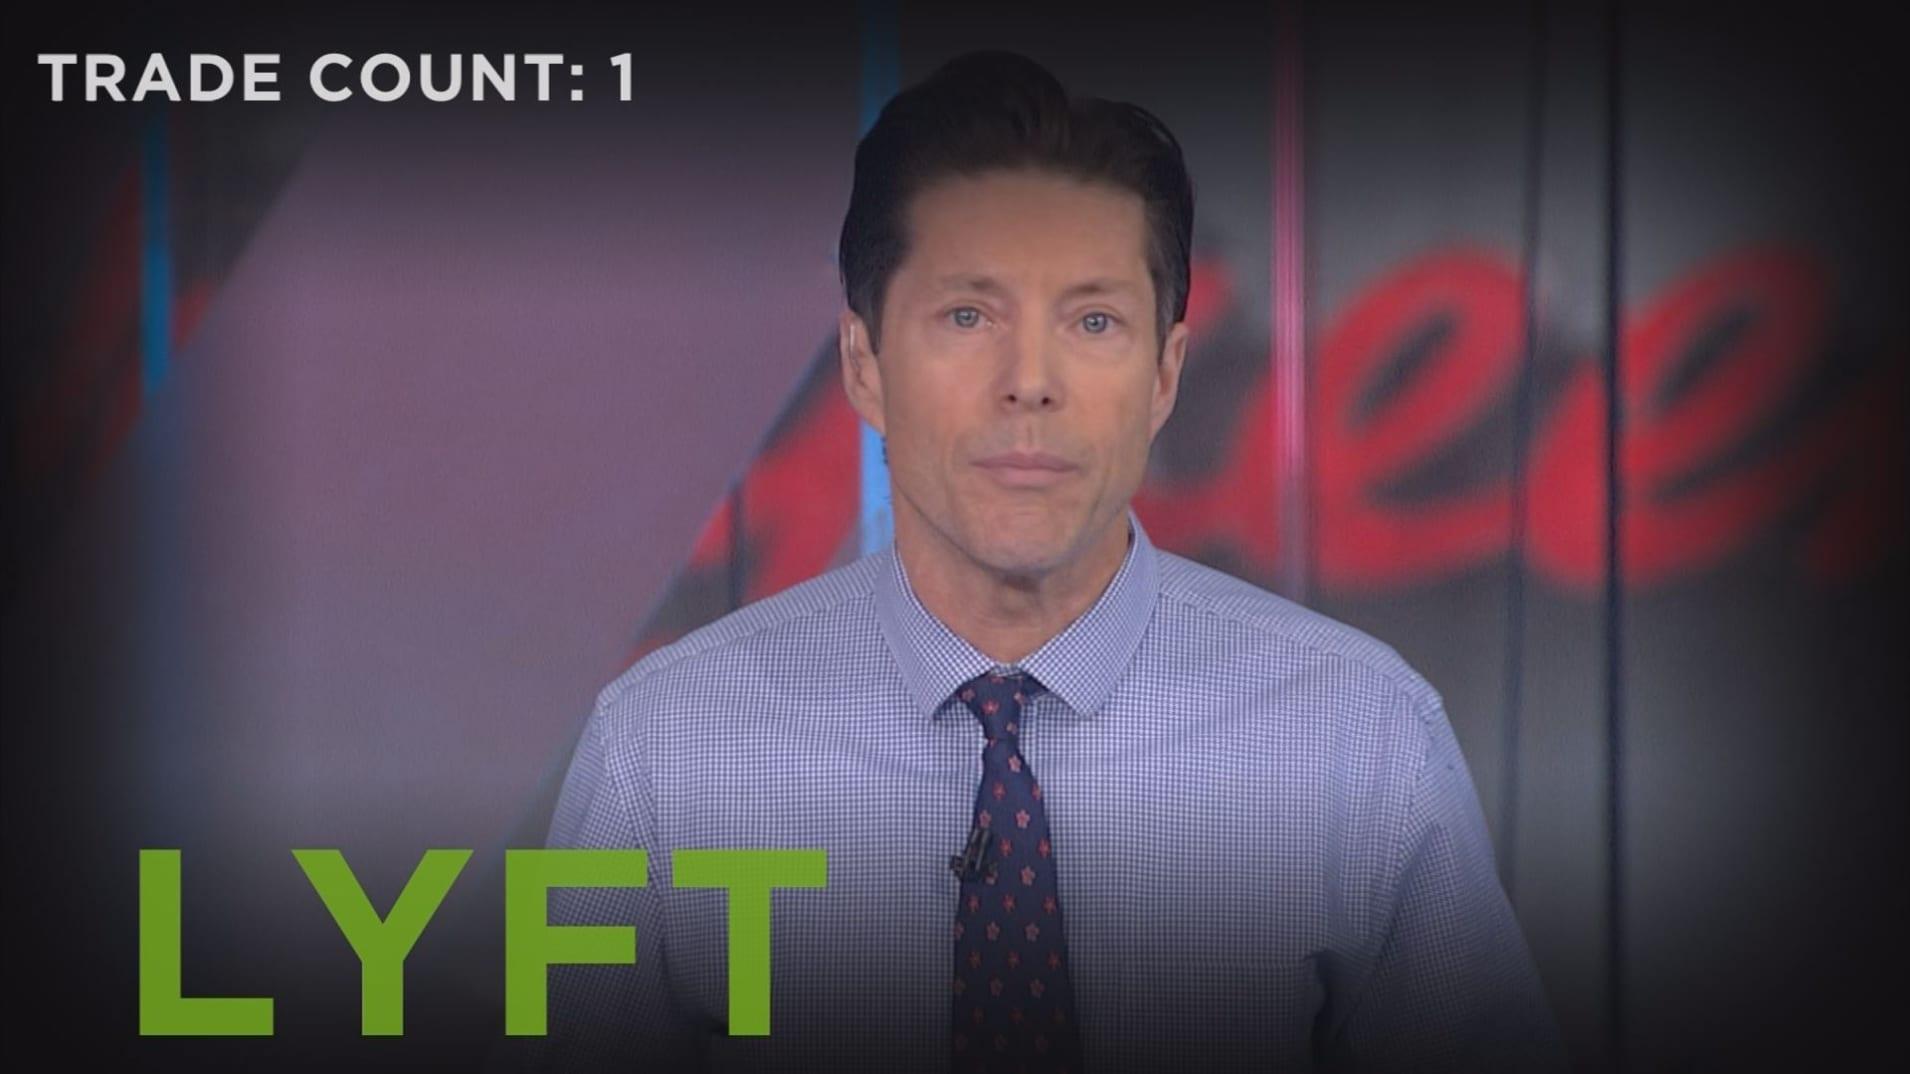 The LYFT IPO: 4 trades